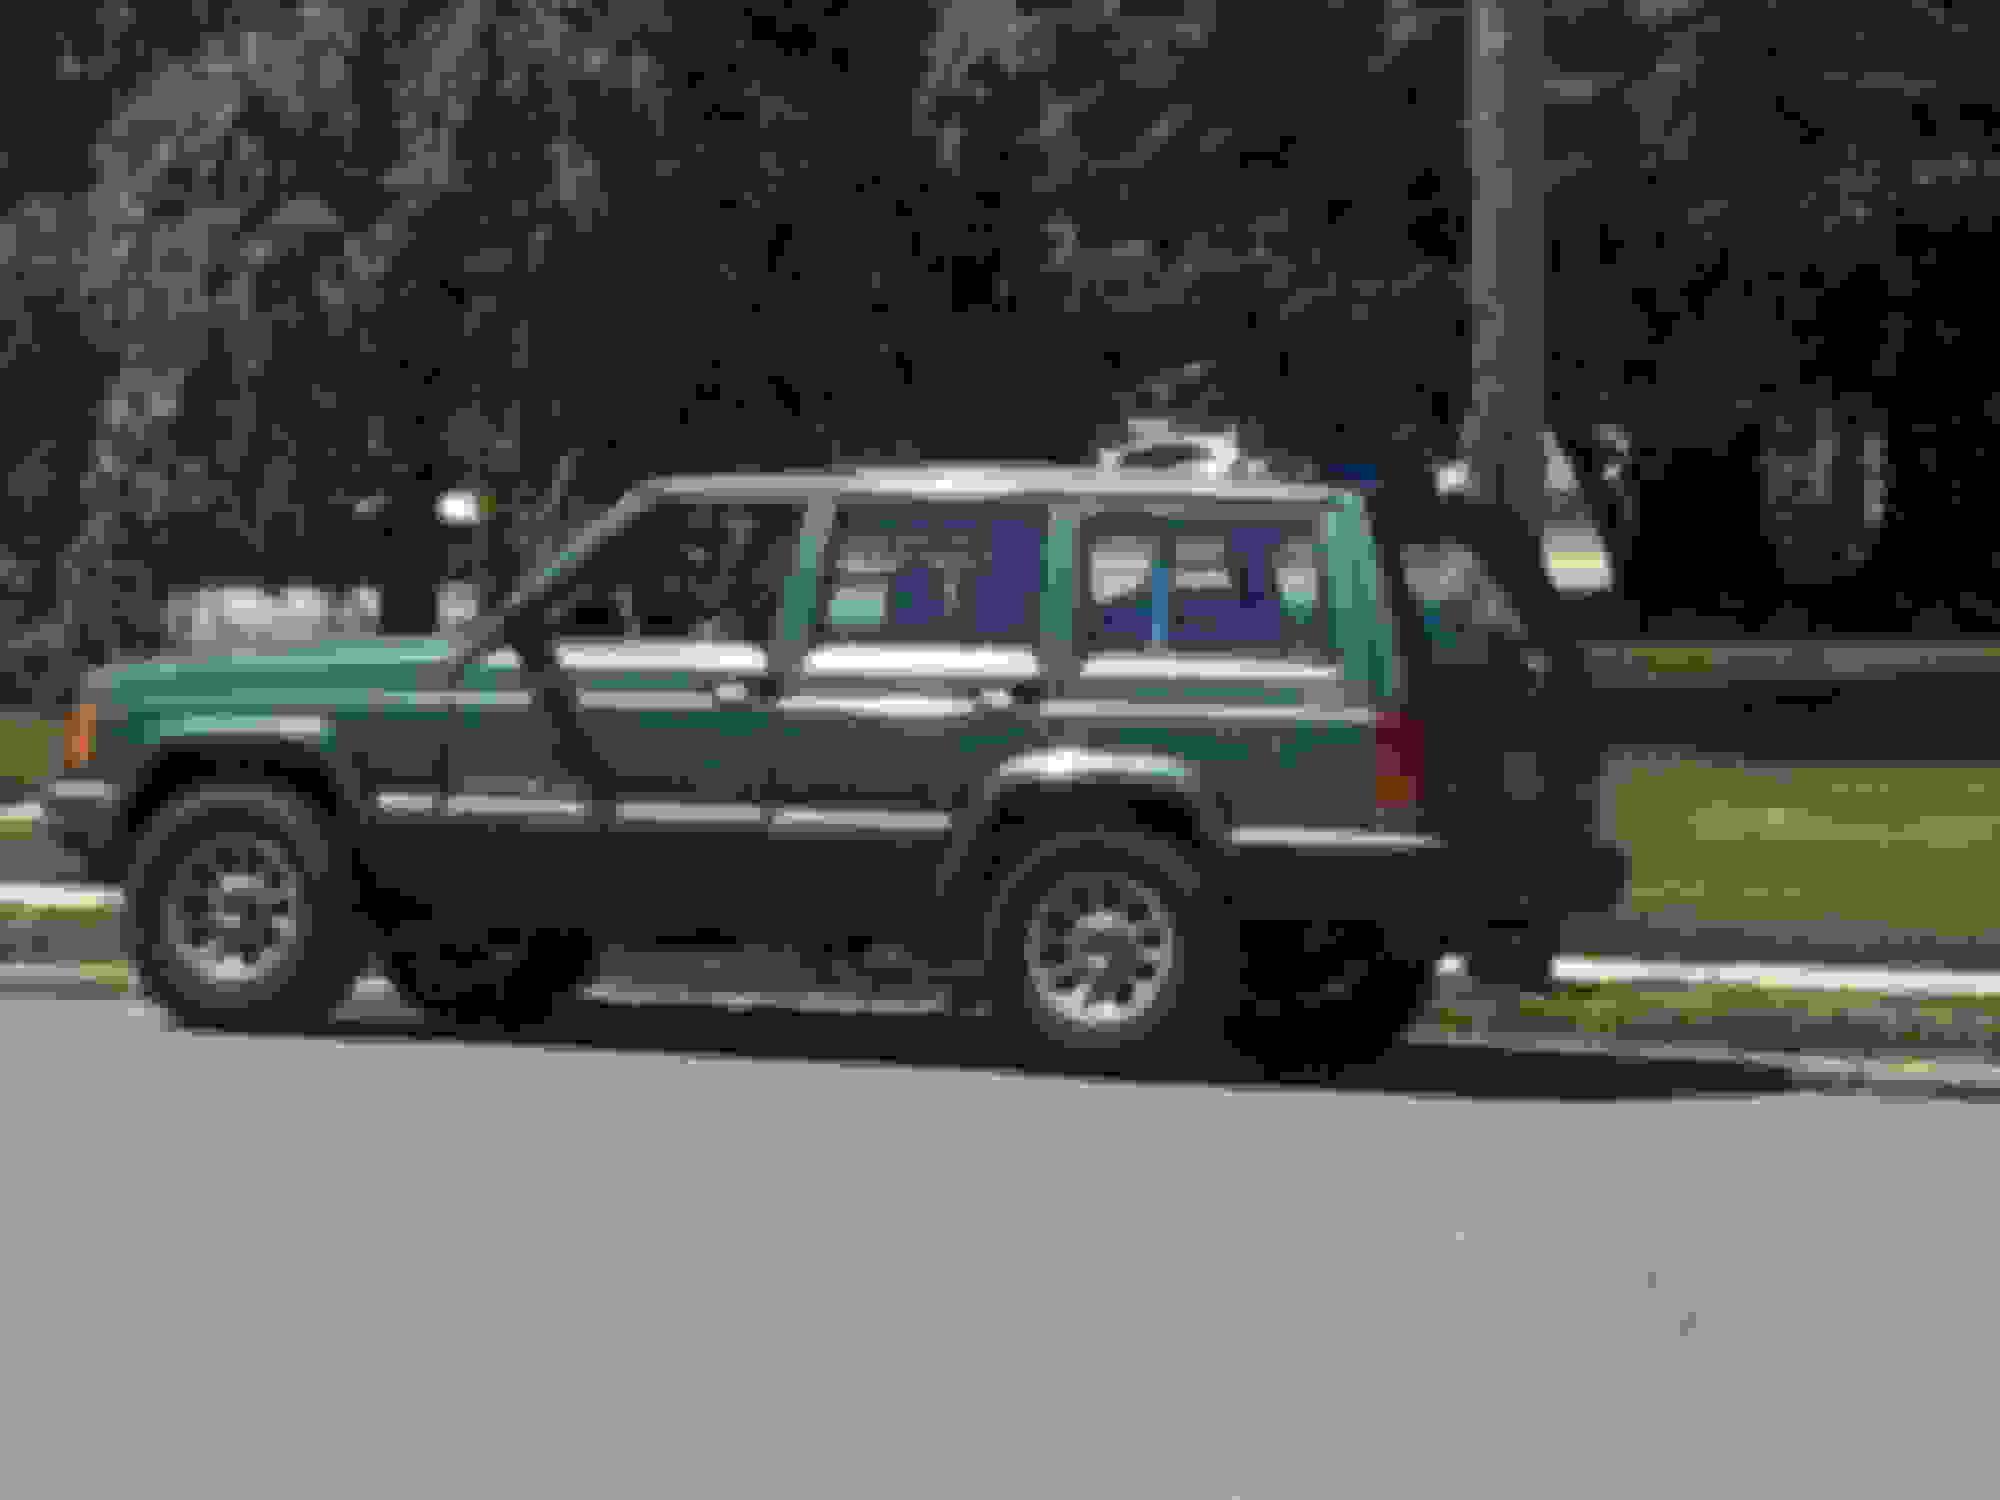 jeep grand cherokee 1997 factory service repair manual pdf